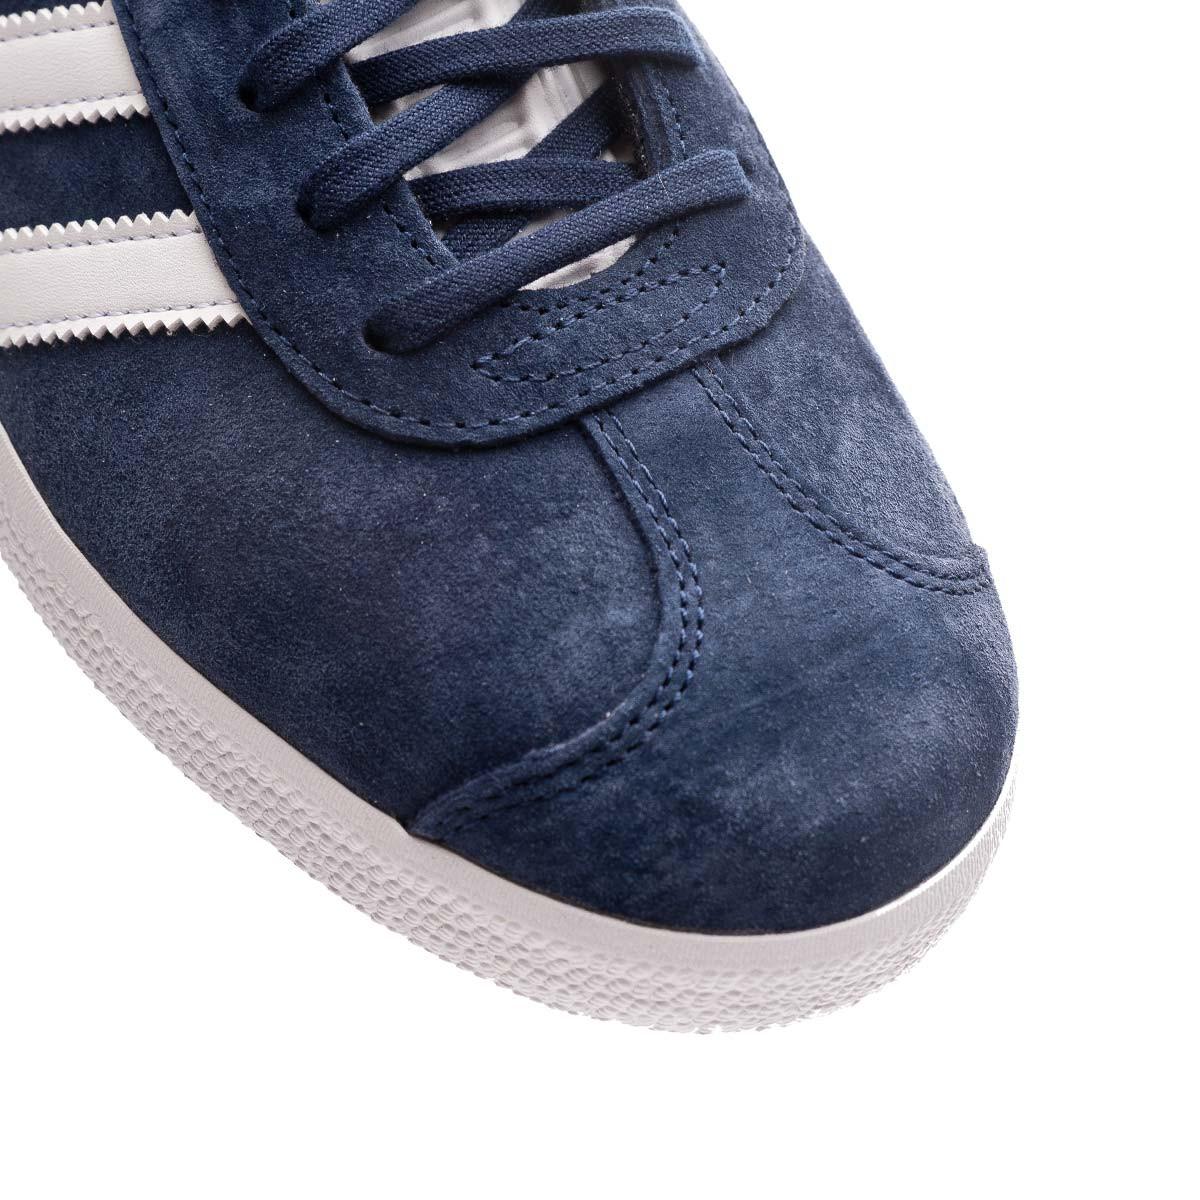 Trainers adidas Gazelle Navy-White-Gold